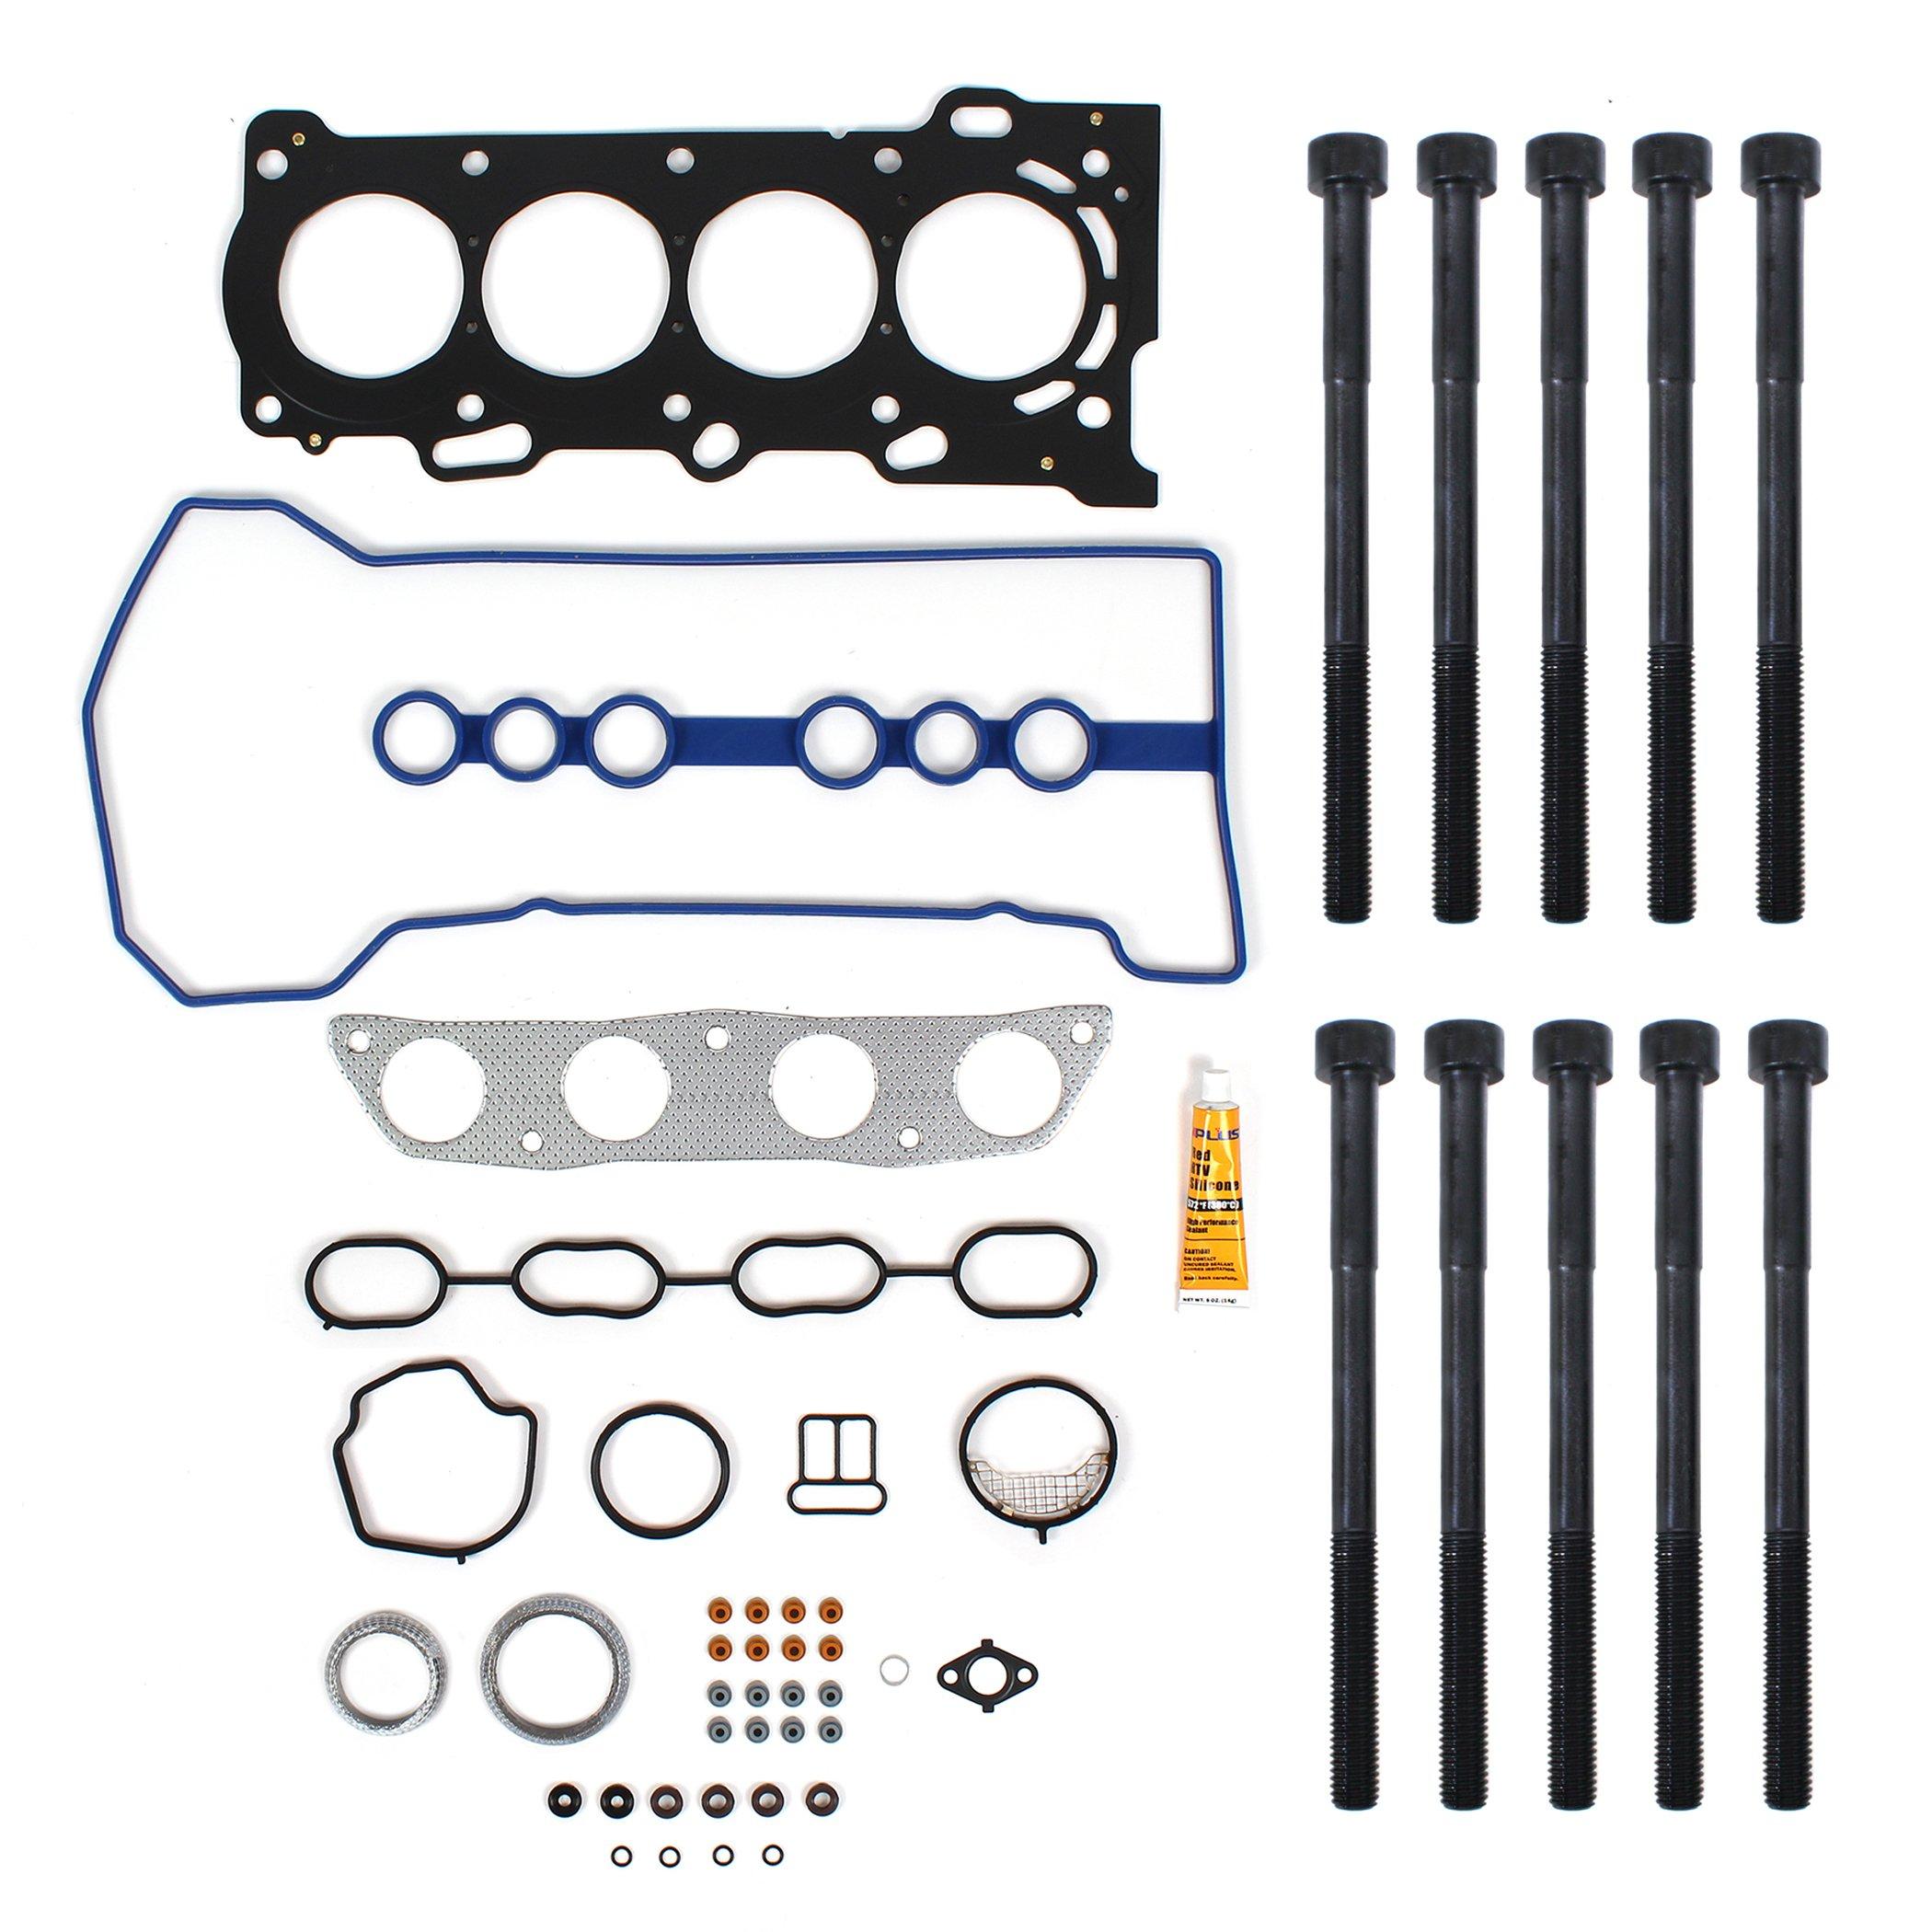 New TS2615803HB MLS Cylinder Head Gasket Set & Head Bolt Kit for 2000-08 Toyota / Pontiac 1.8L 1ZZFE 1ZZ-FE engine